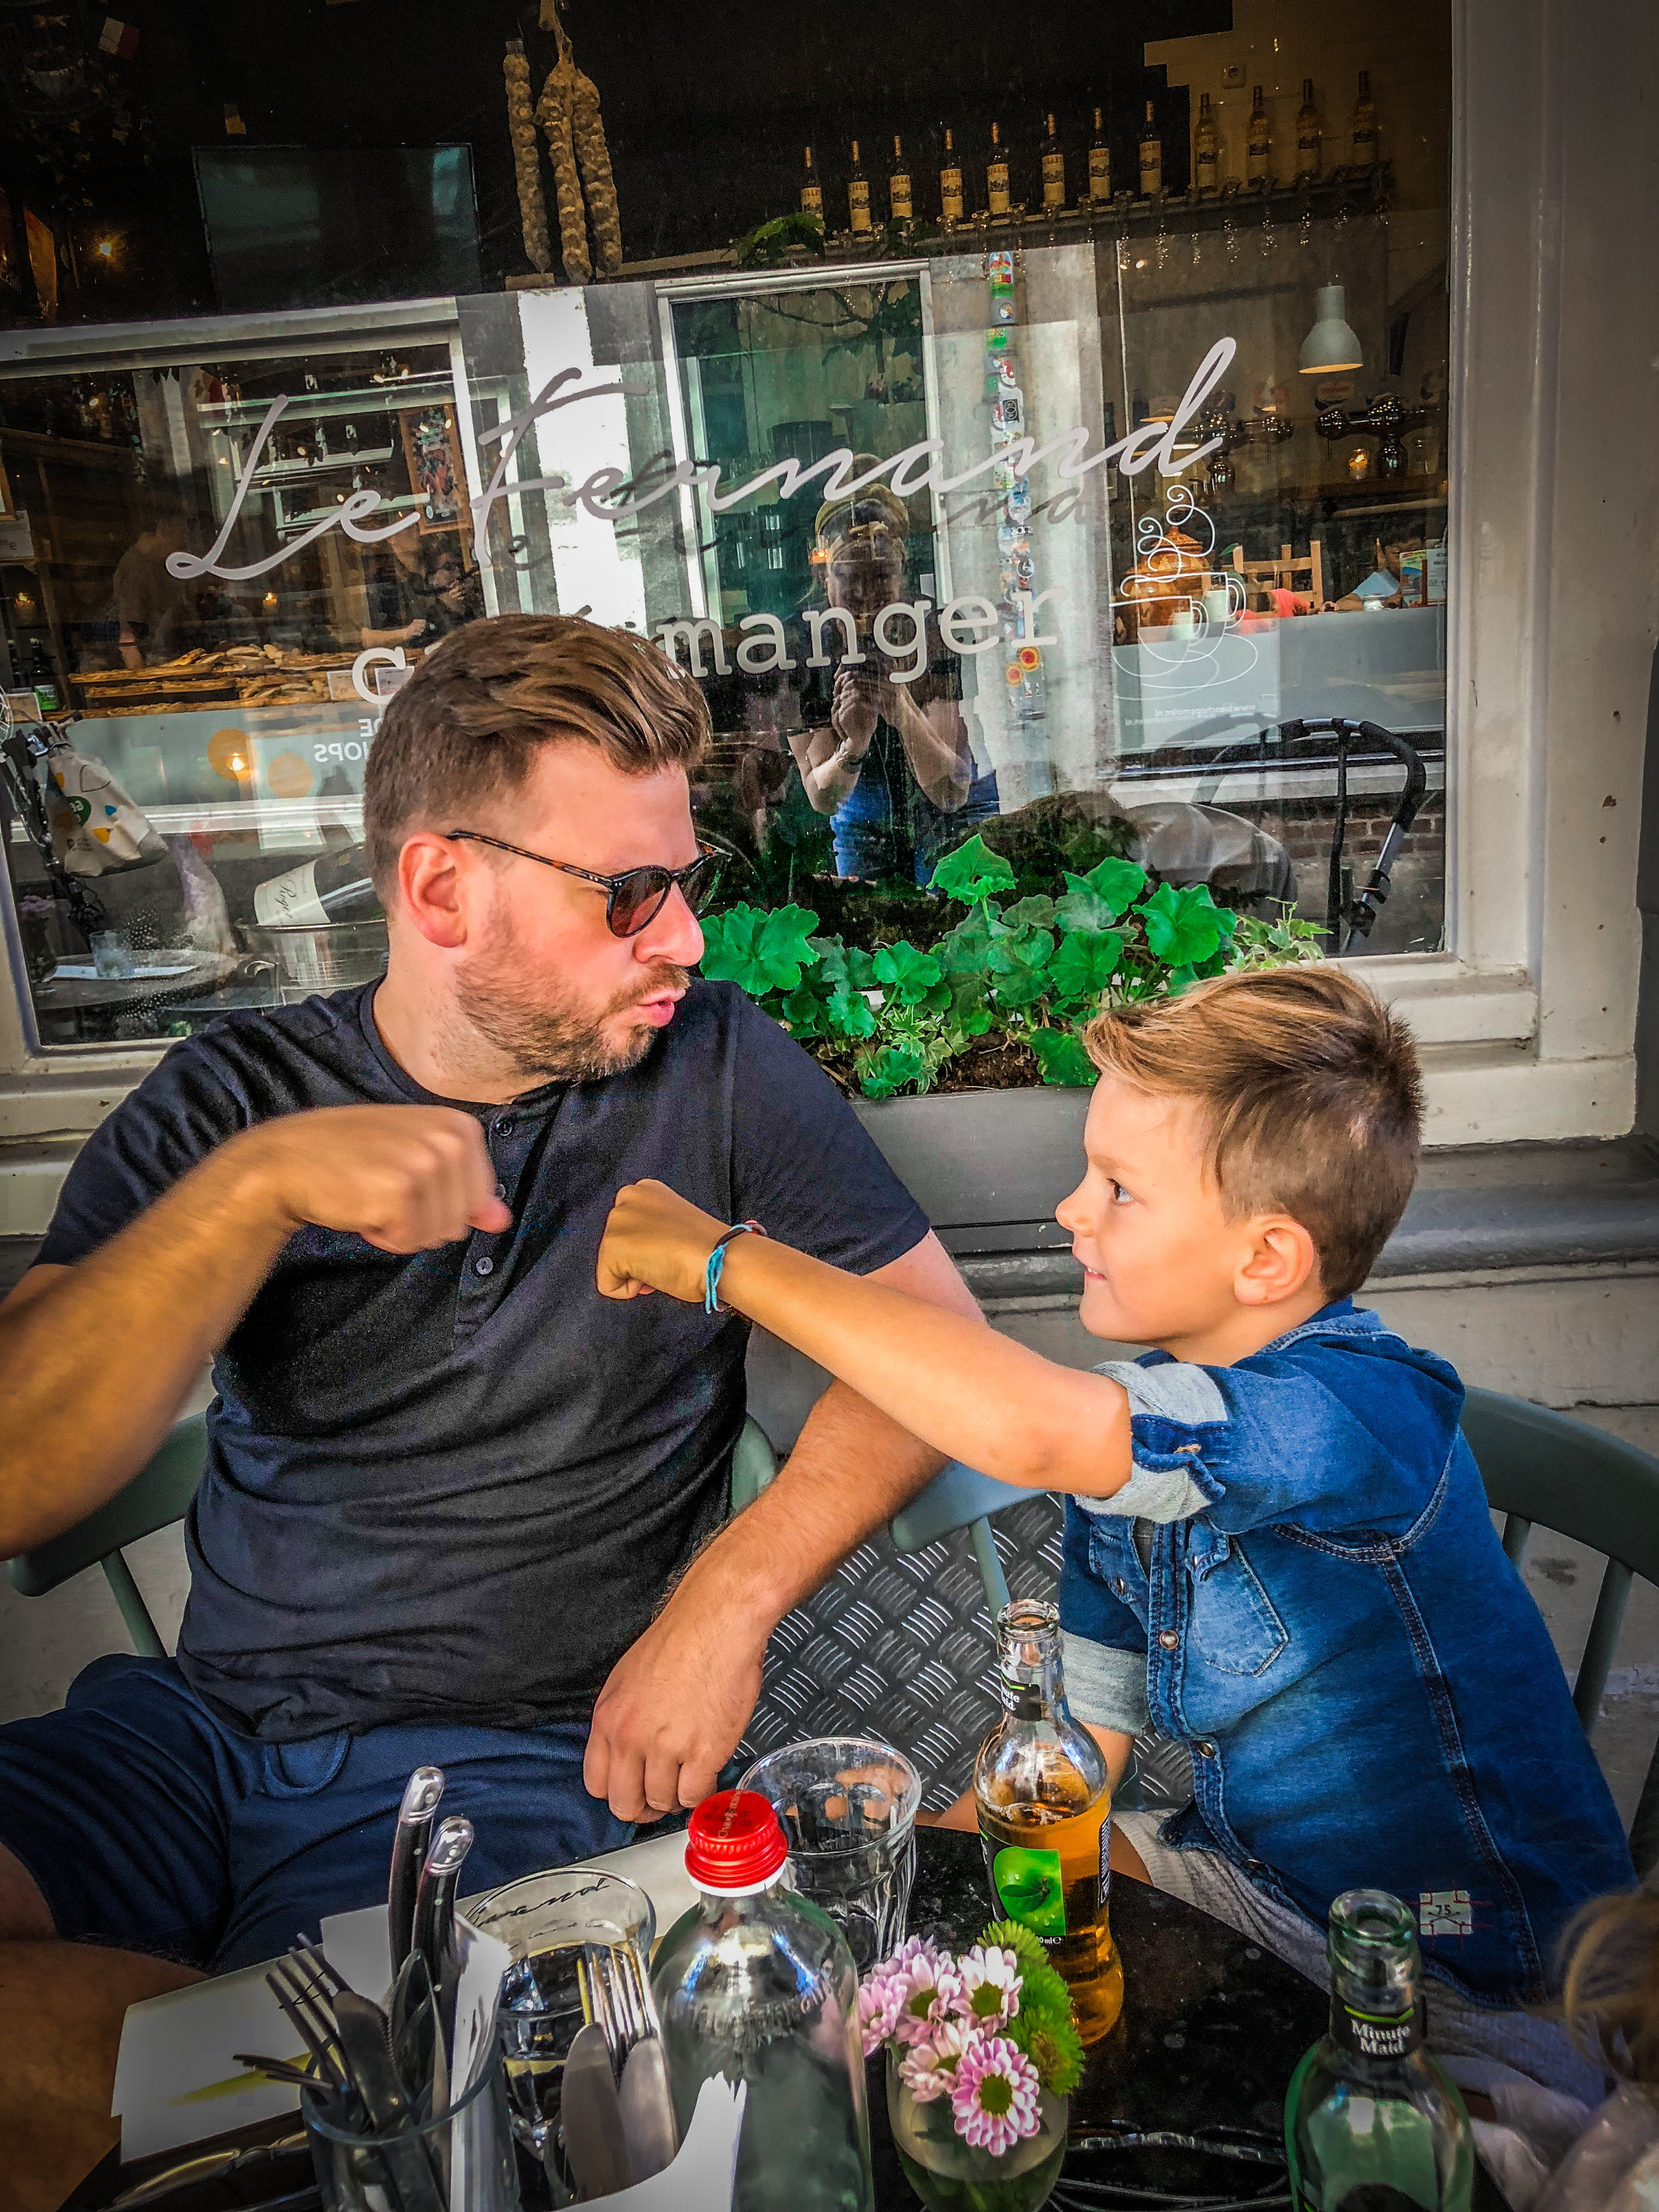 le fernand maastricht_terras_reizenmetkinderen-3.JPG